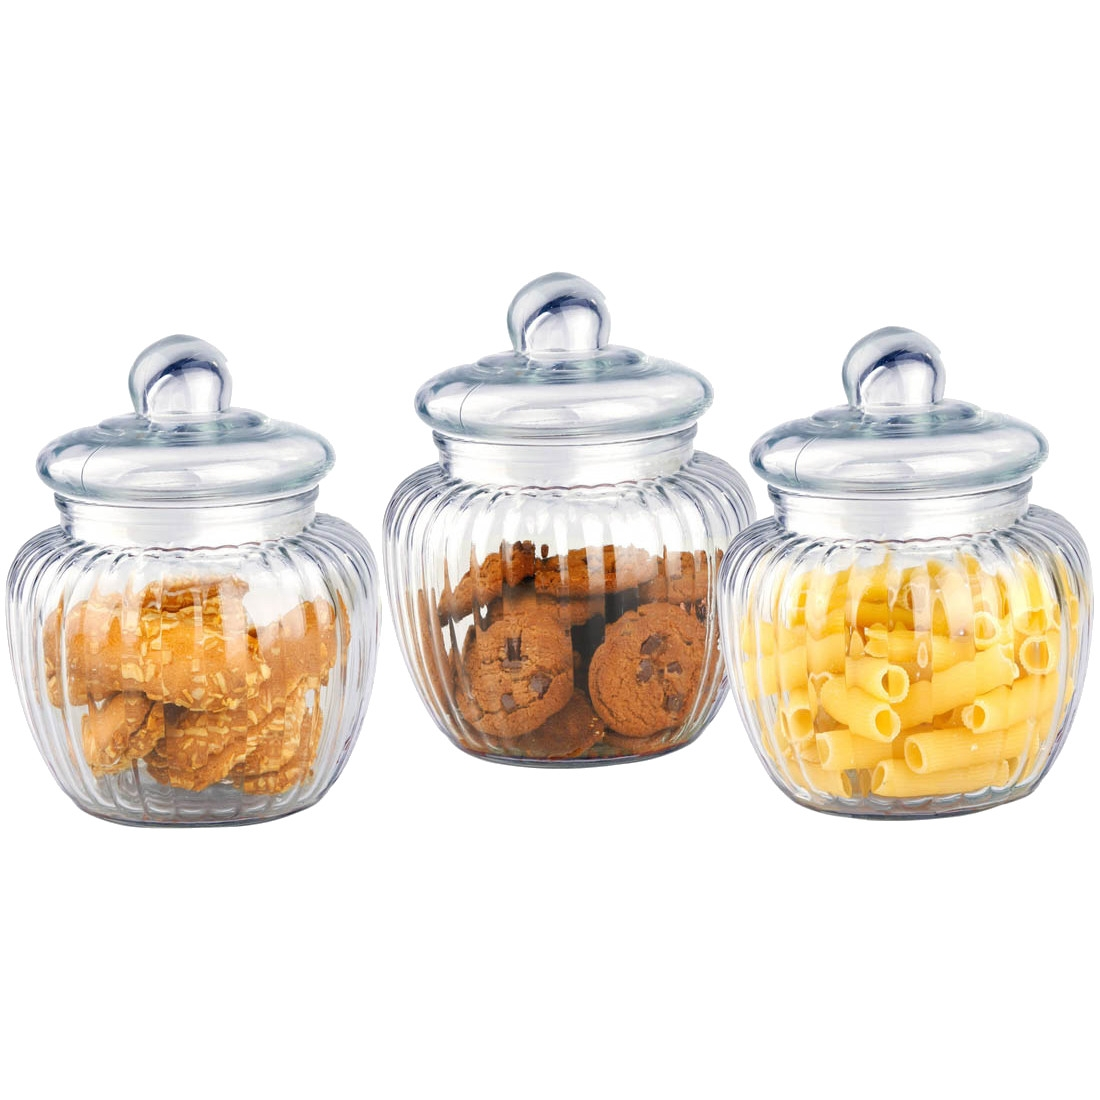 Home Basics 3-Piece Glass Jar Set by HDS Trading Corp.